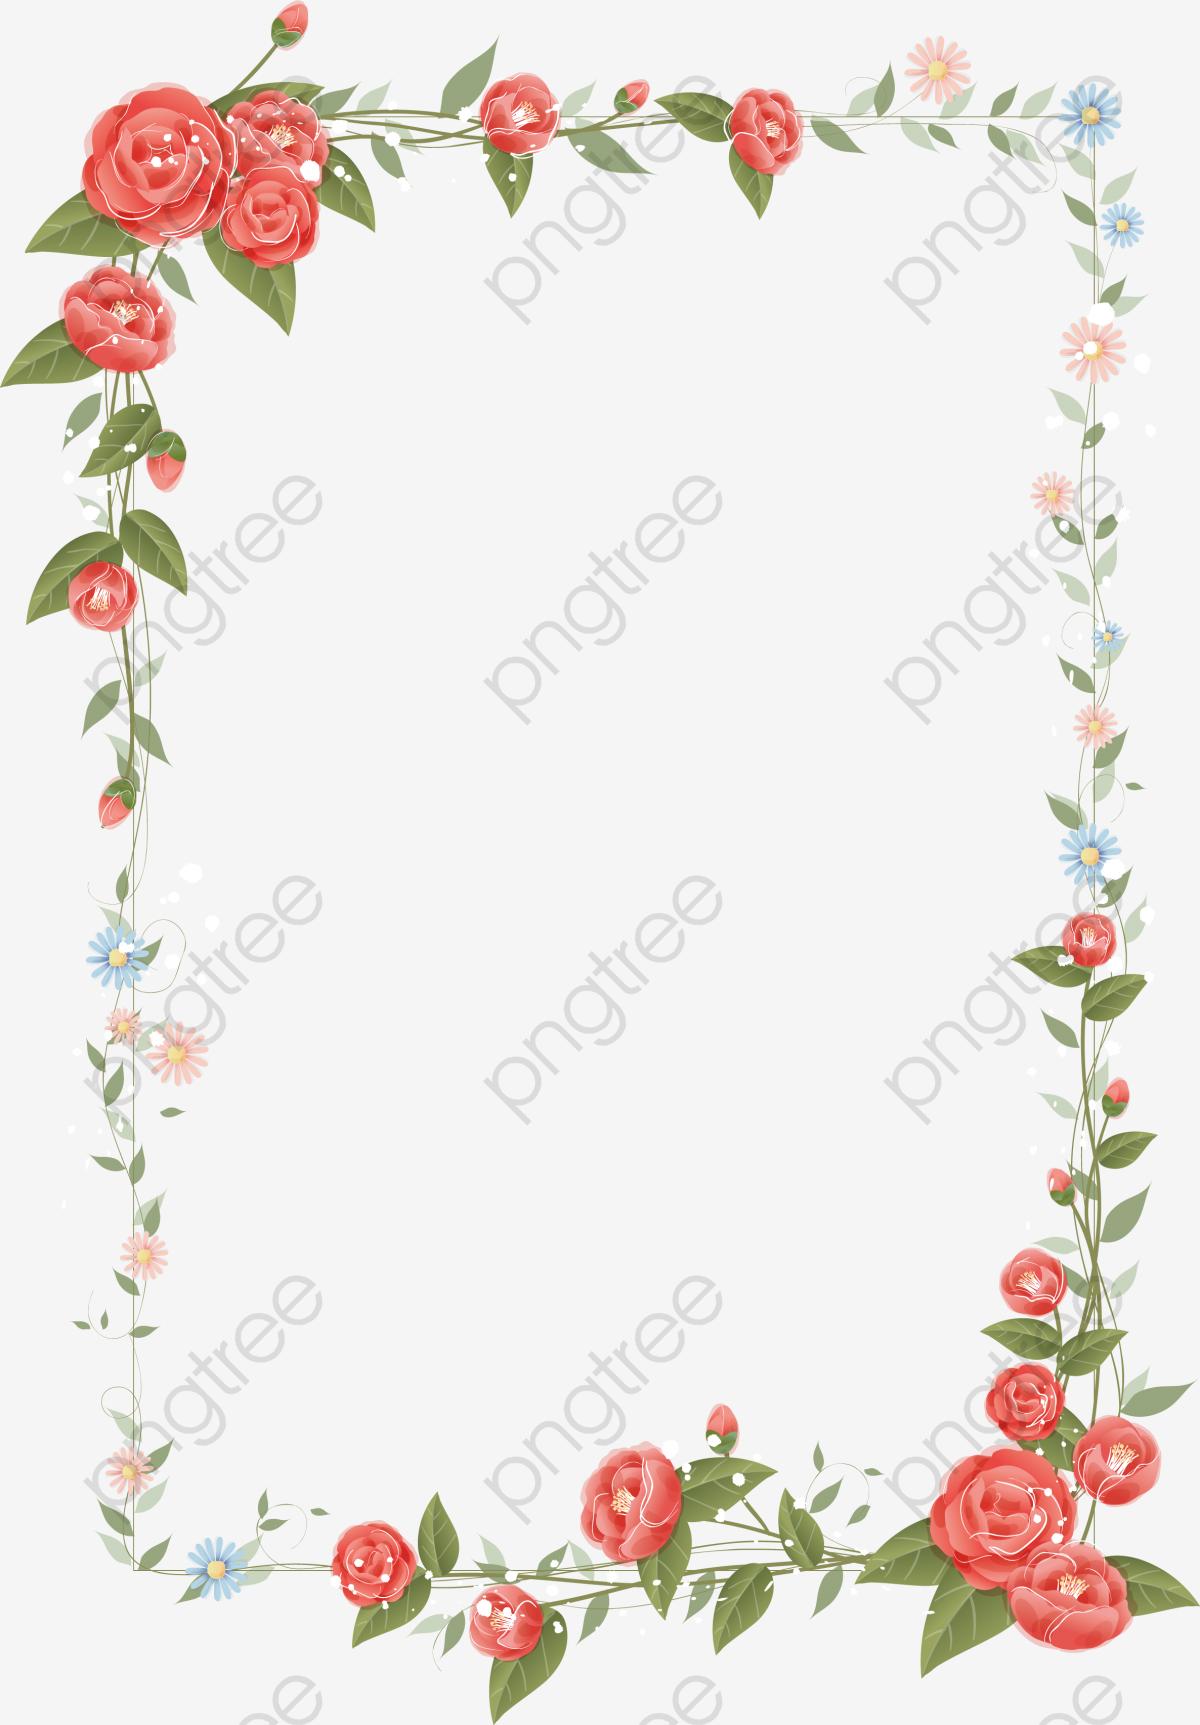 Transparent Floral Border Design Vector Png Format Image With Size